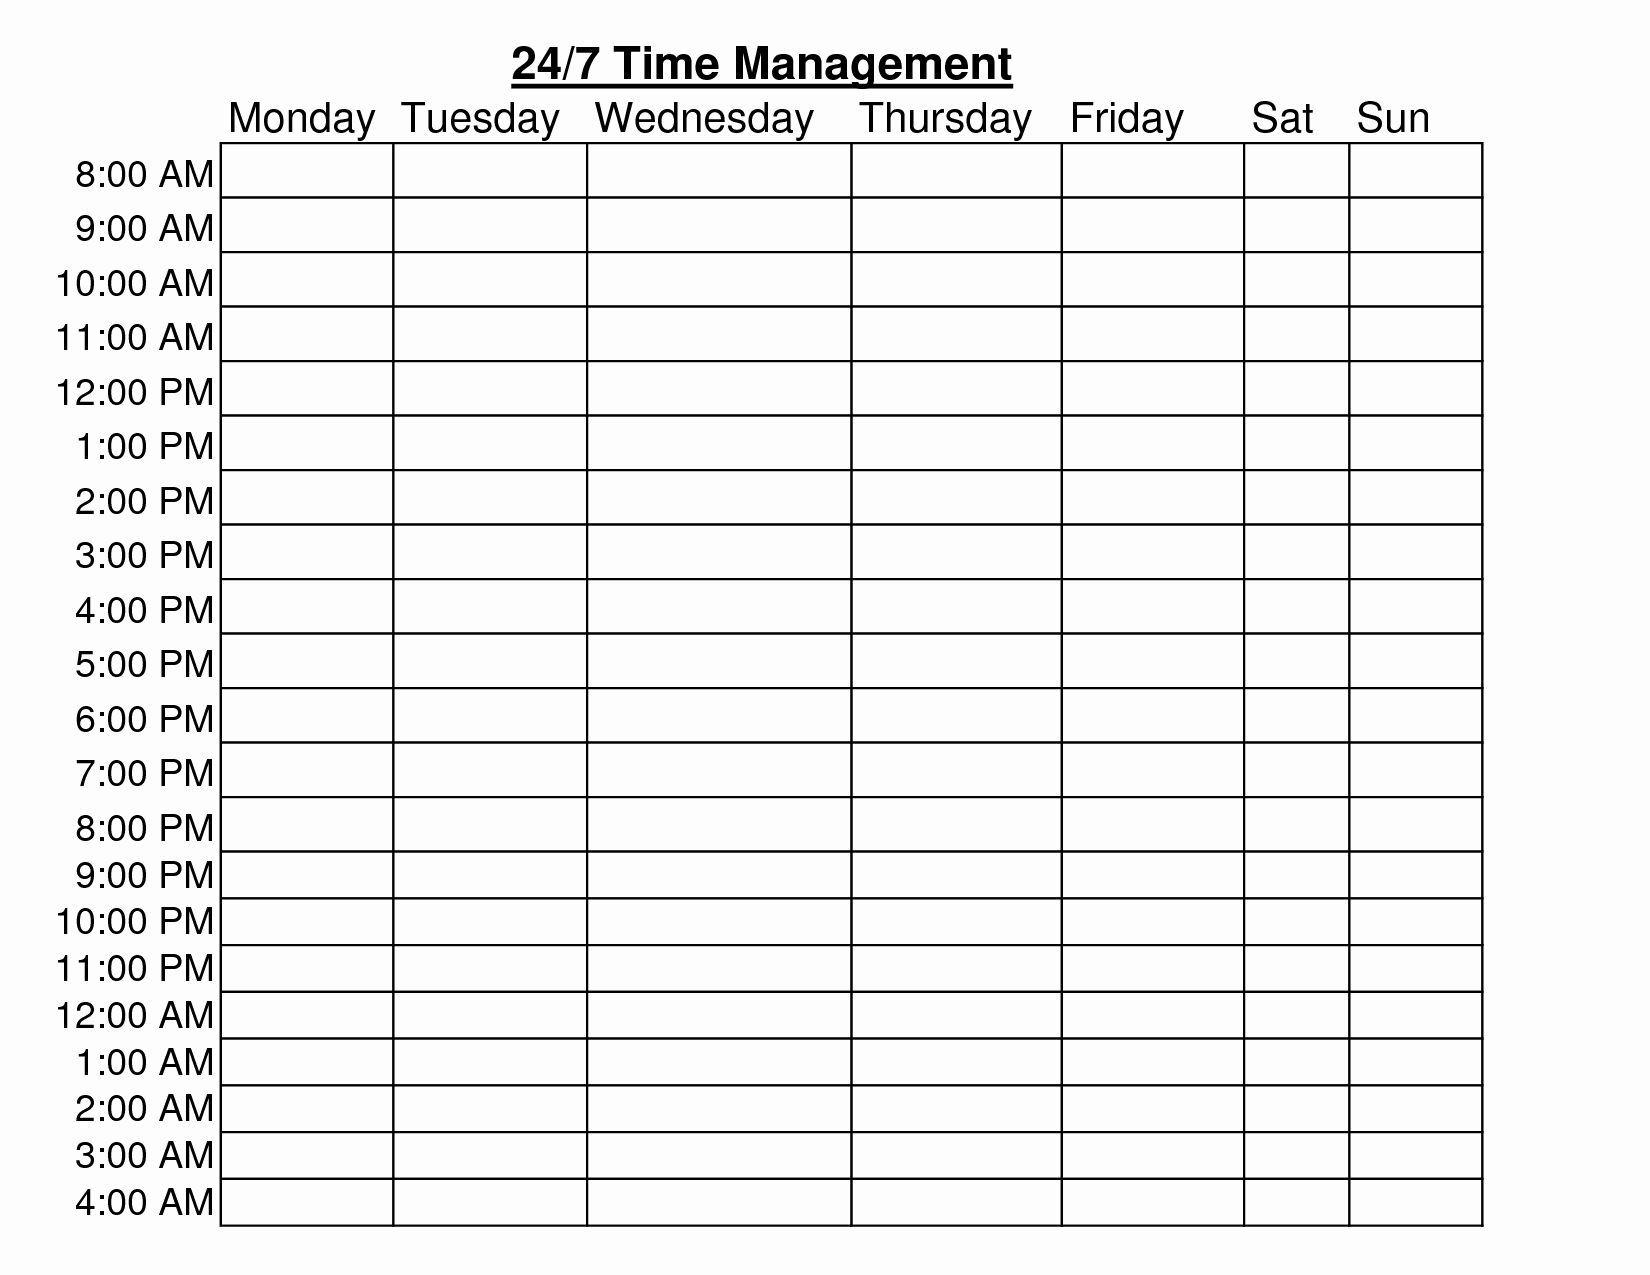 7 Days Week 24 Hour Schedule Ms Word Template